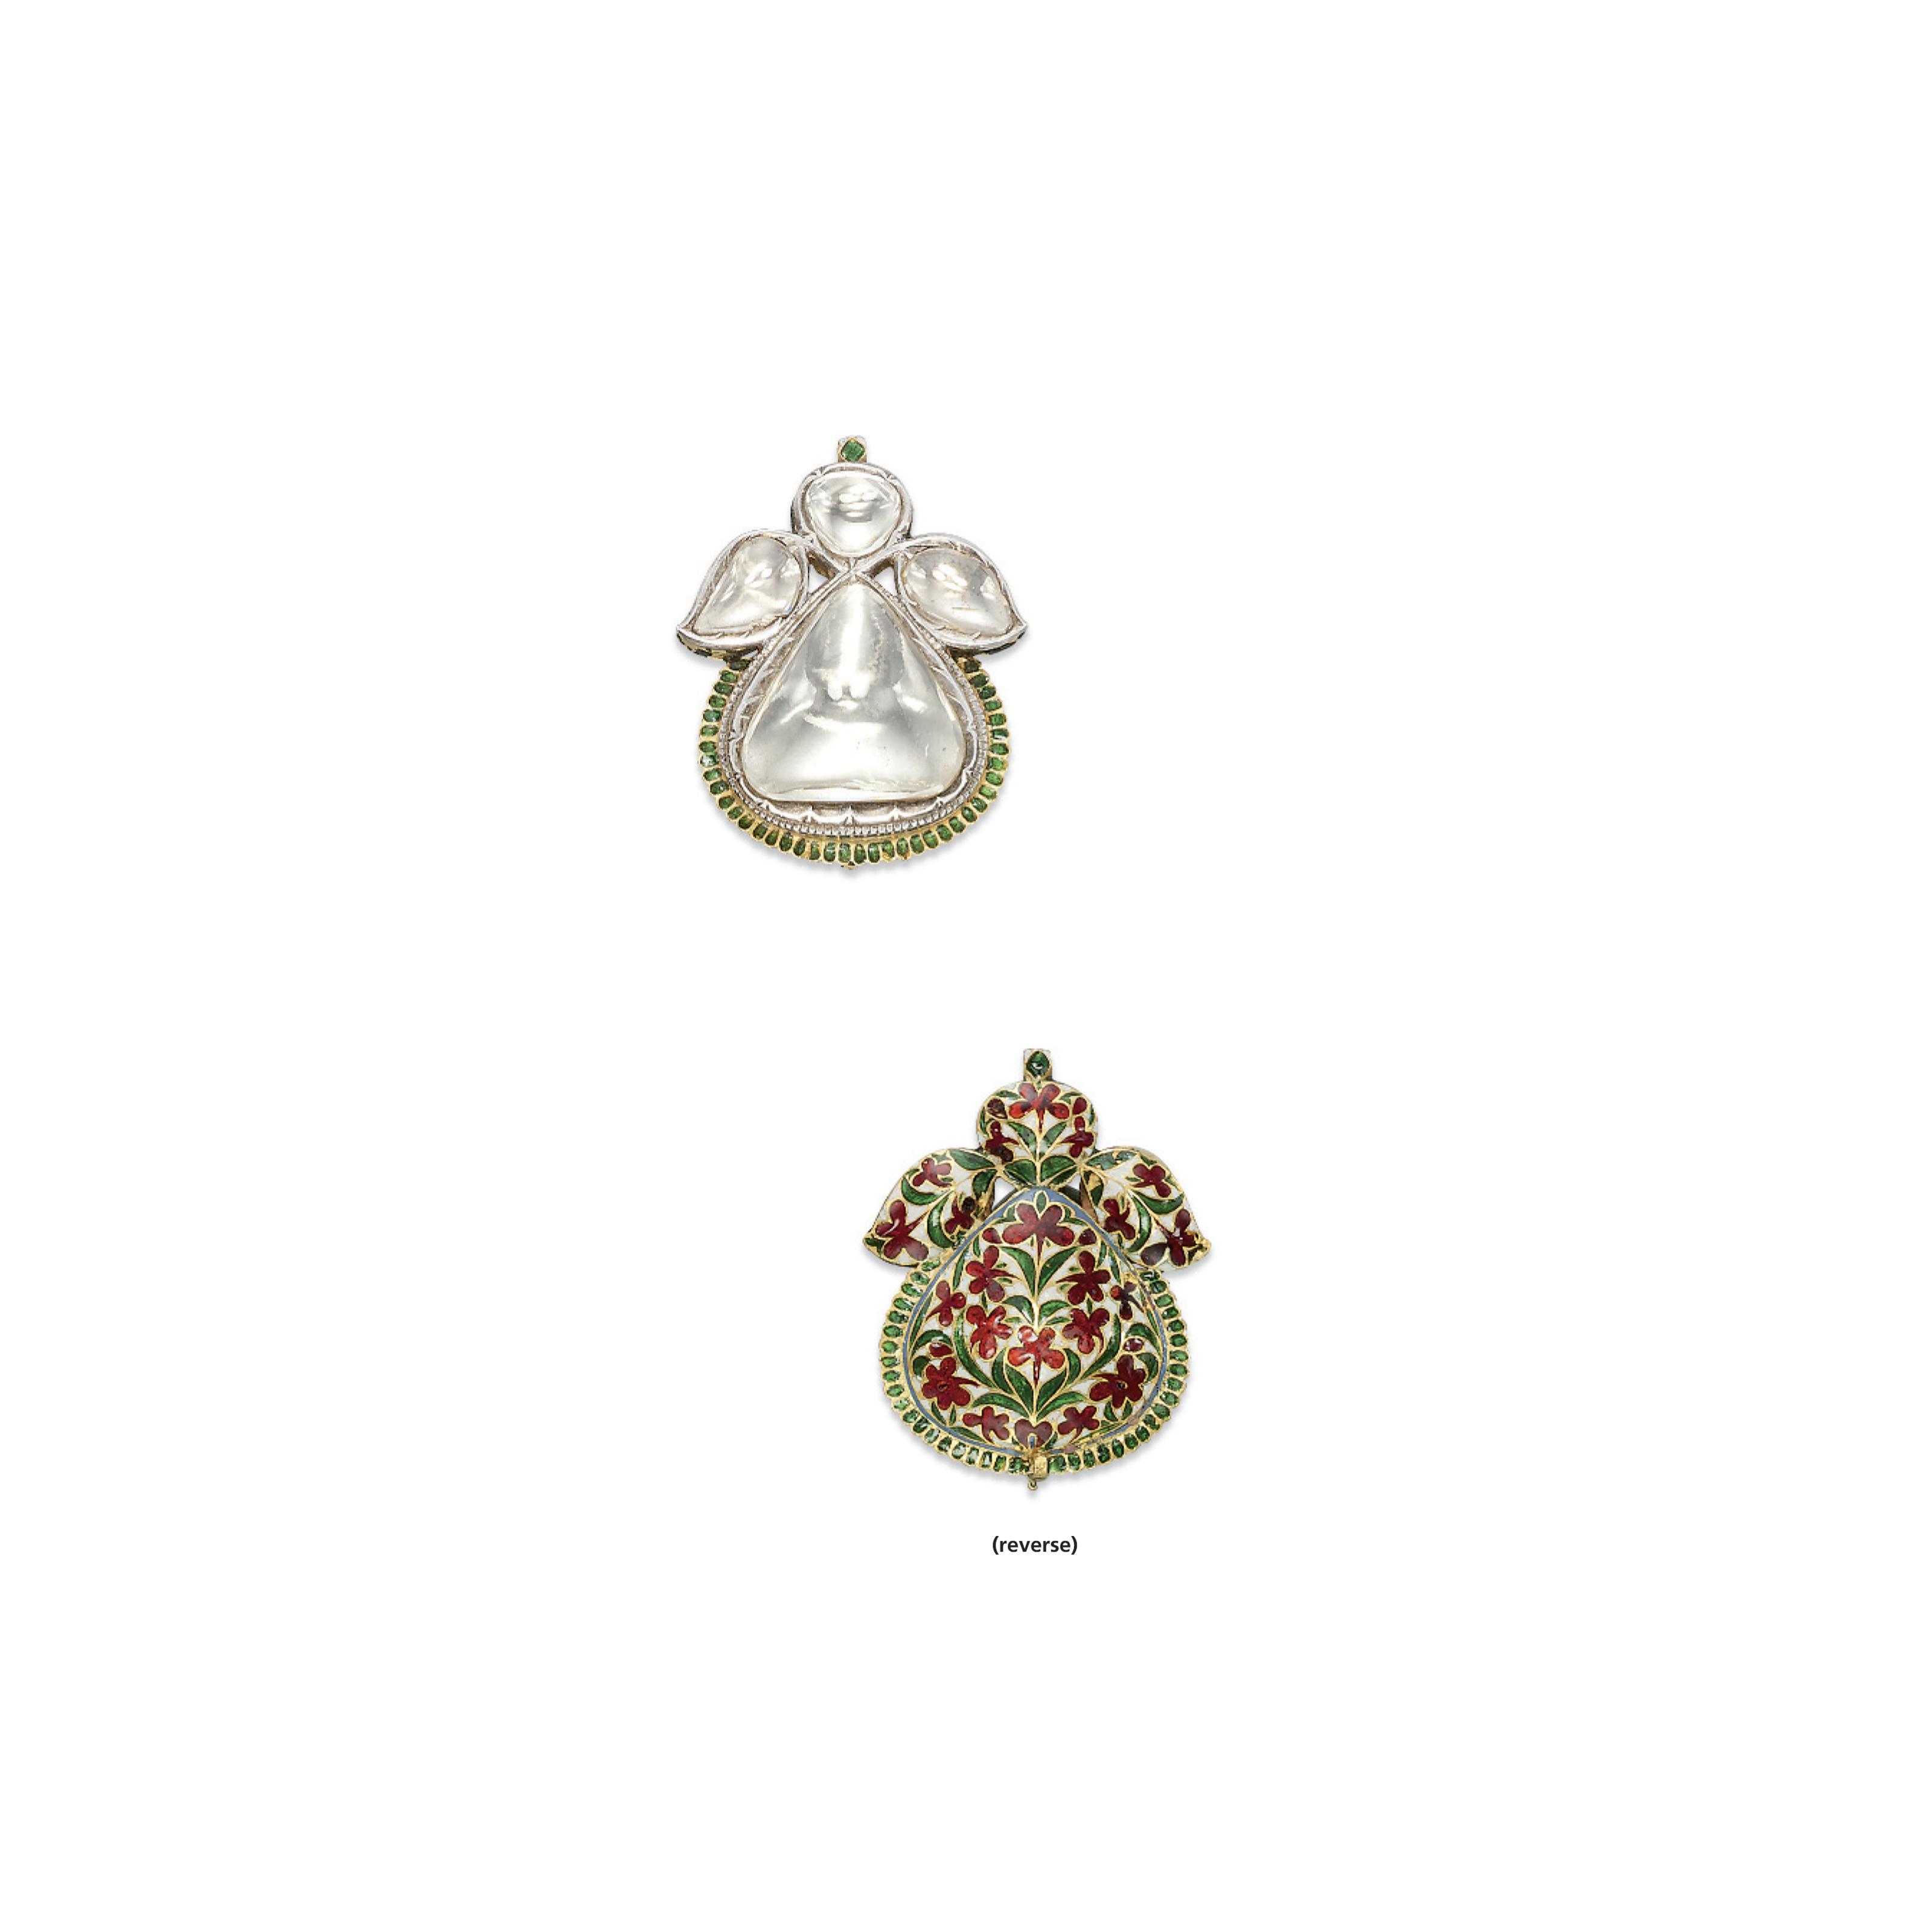 AN ANTIQUE INDIAN DIAMOND AND ENAMEL PENDANT